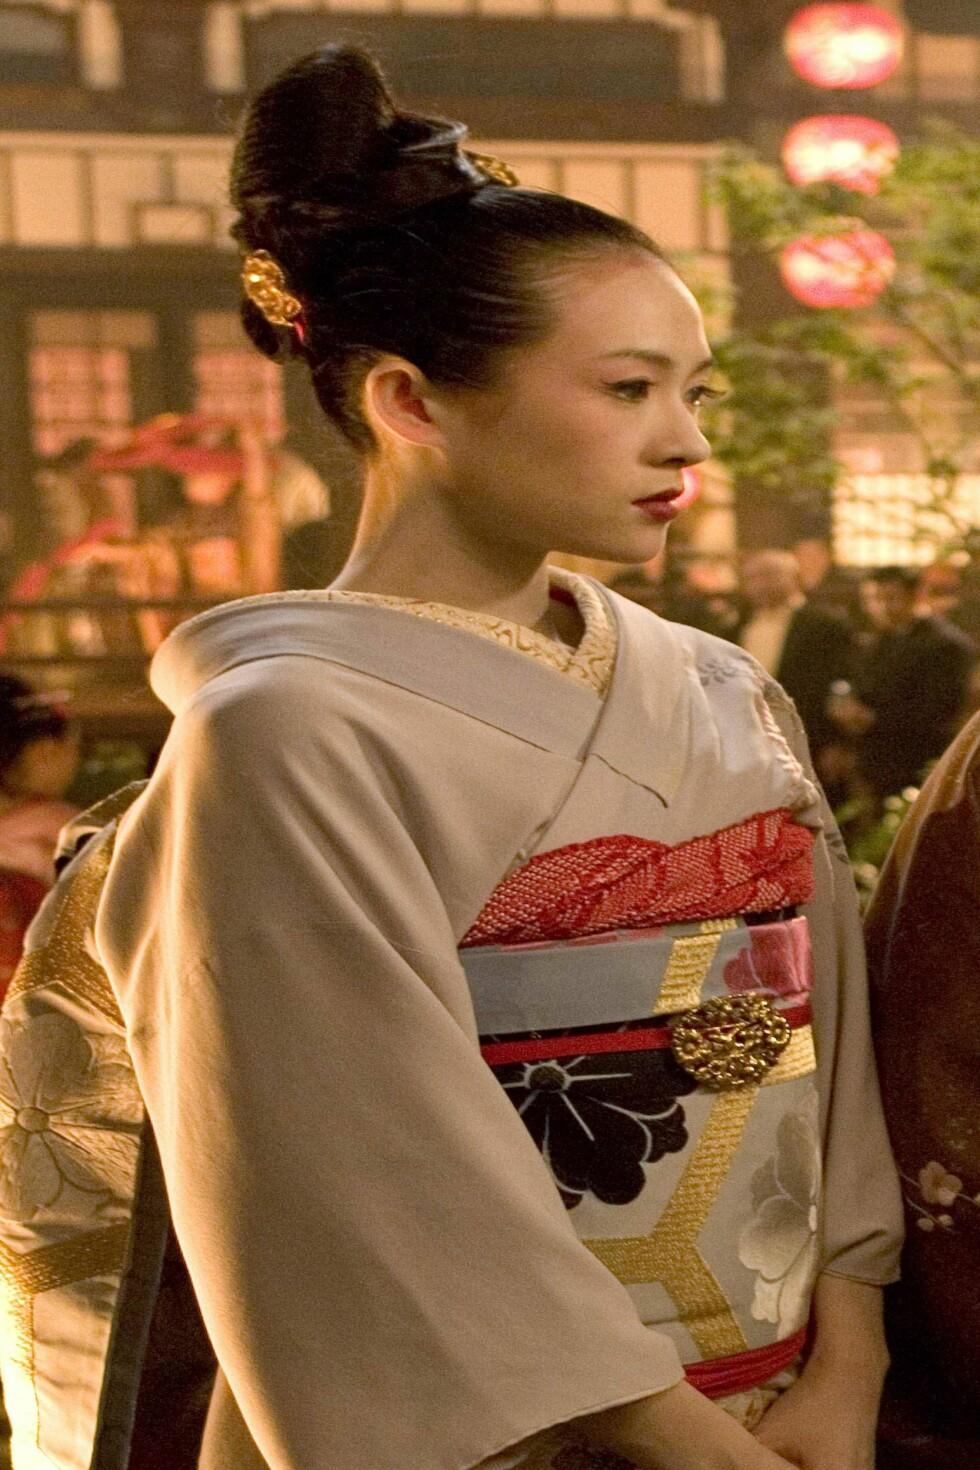 Geishaenes makeup